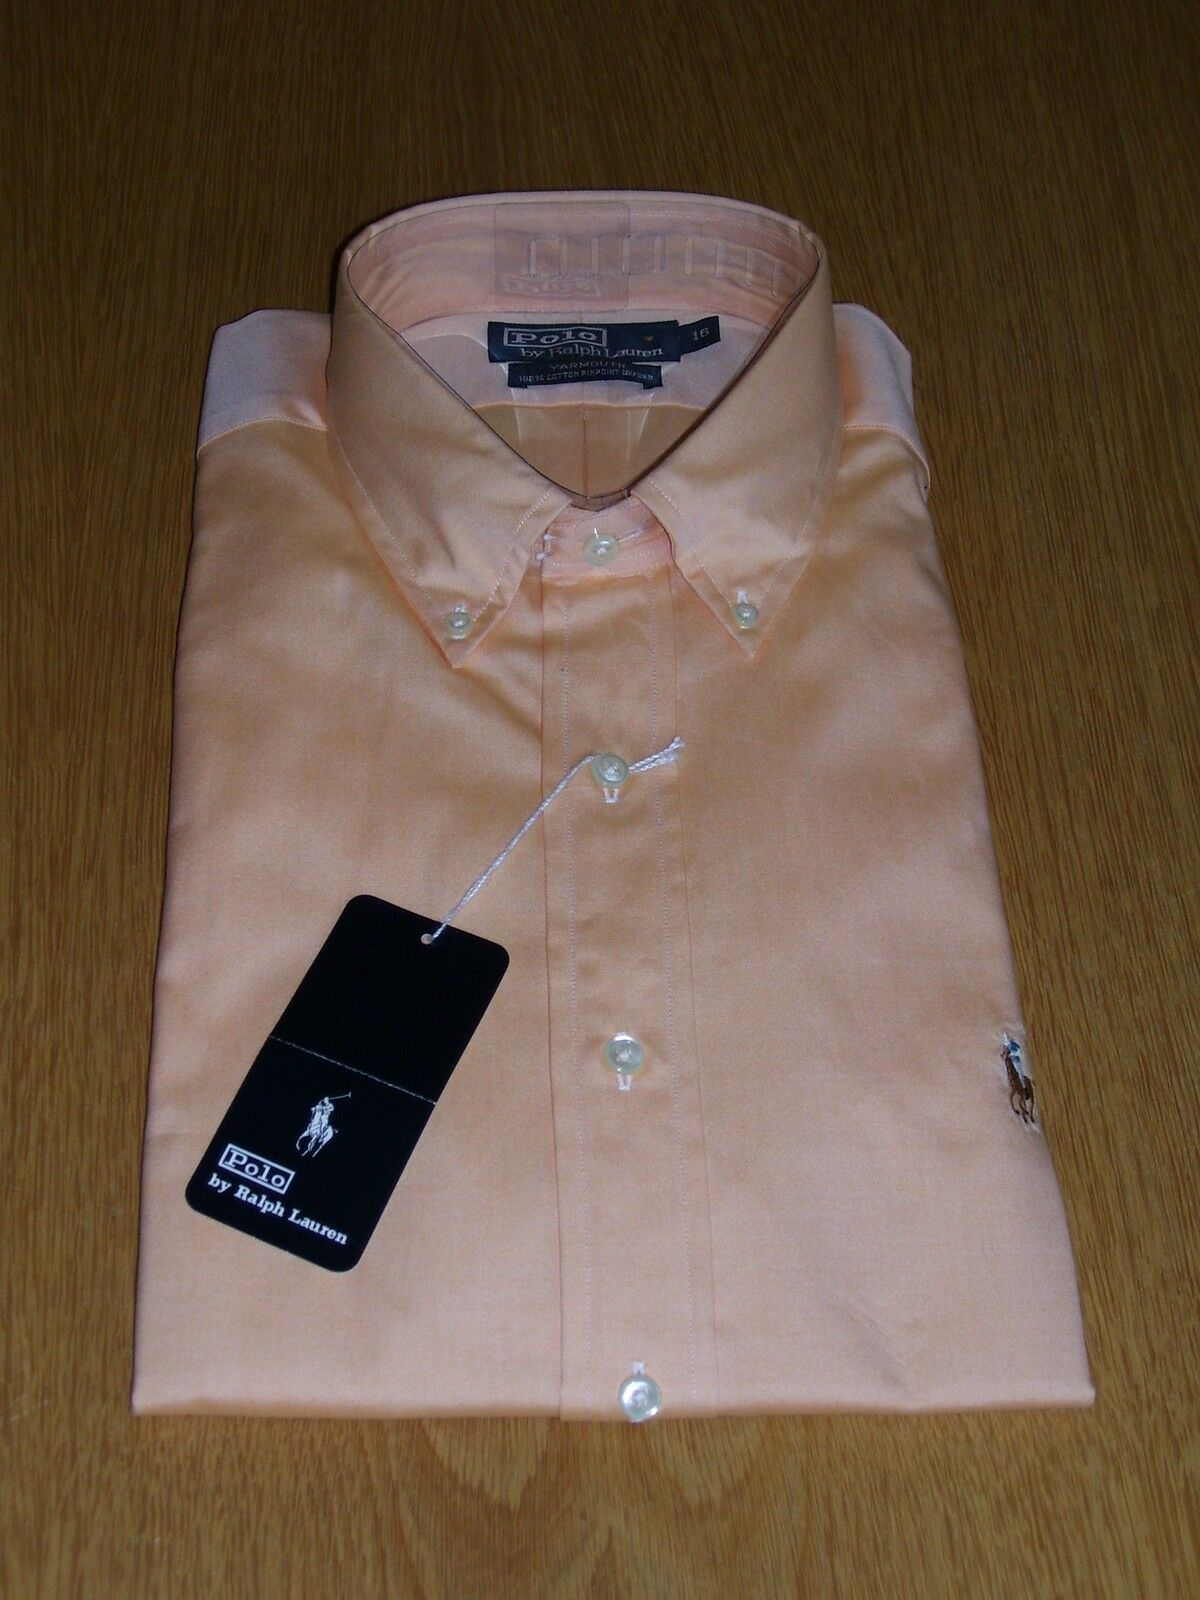 Polo by Ralph Lauren Hemd, Langarm, Oxford, lachs, apricot, Gr. 16, ( L ),  neu